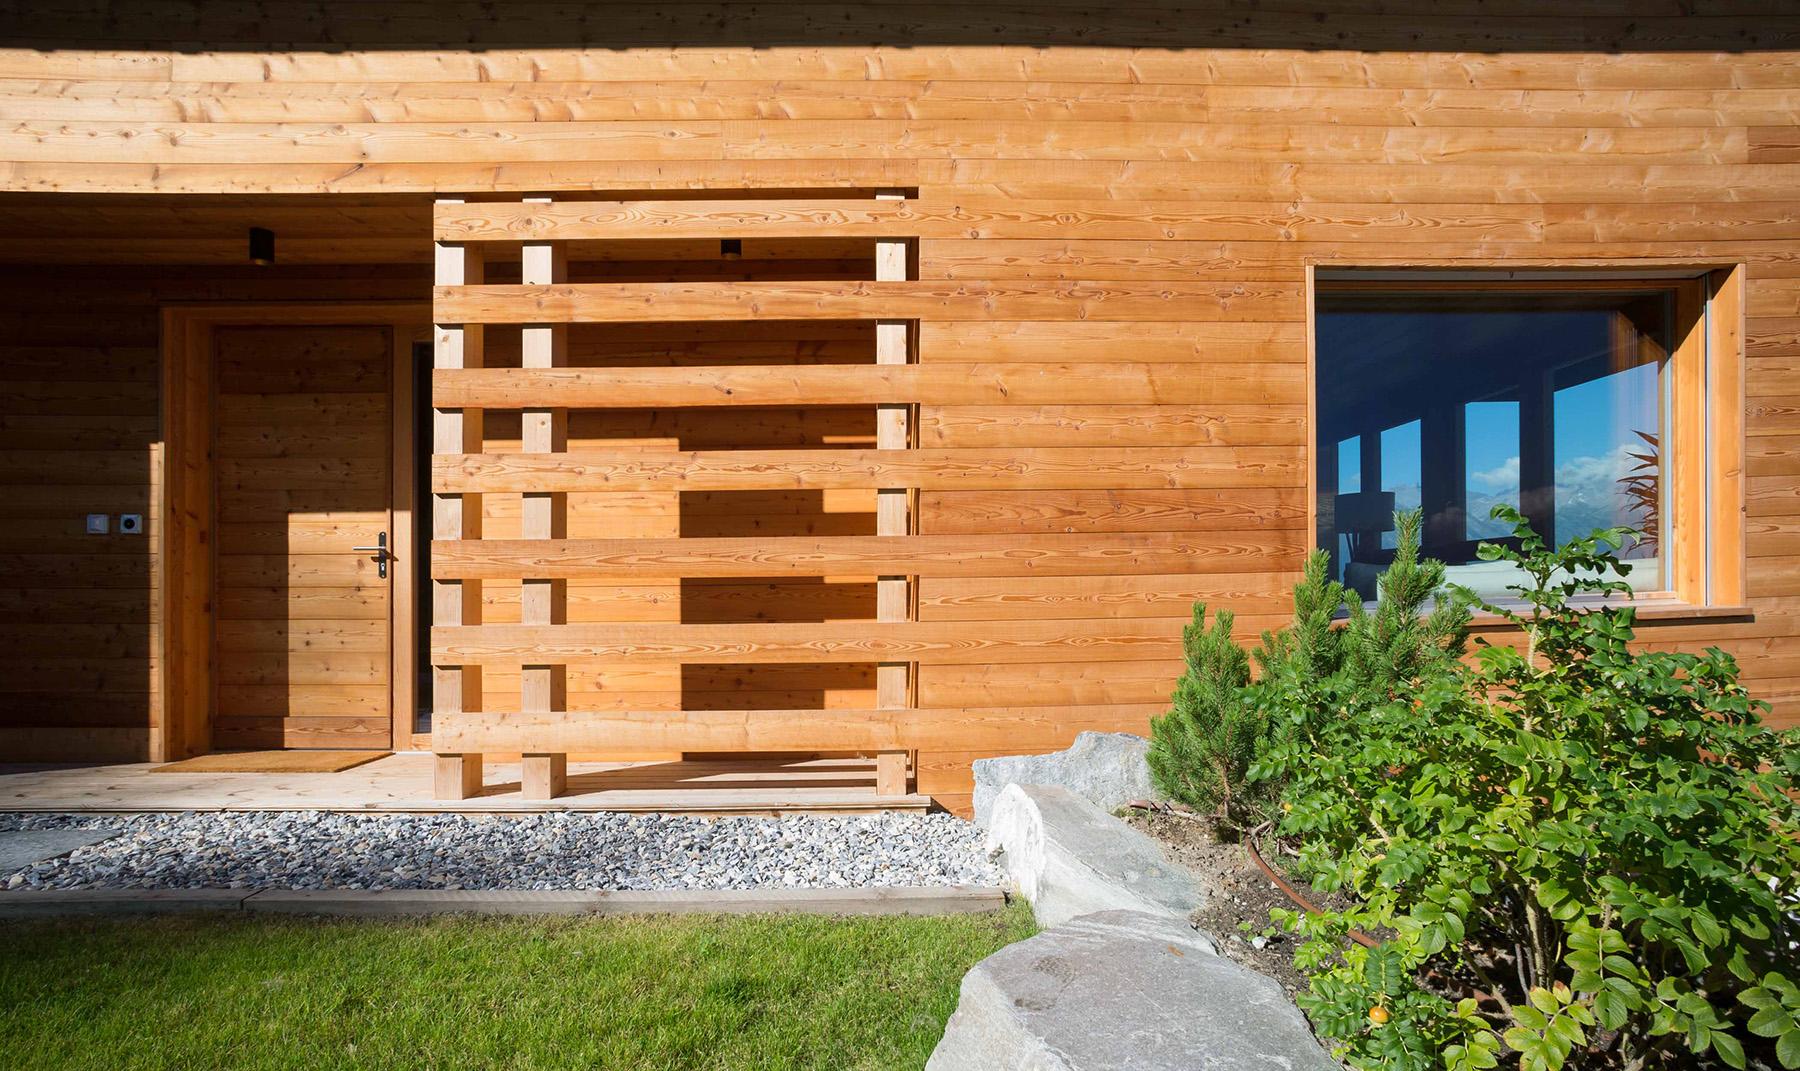 Architecte maison bois architecte maison bois agrandir for Agrandir maison bois